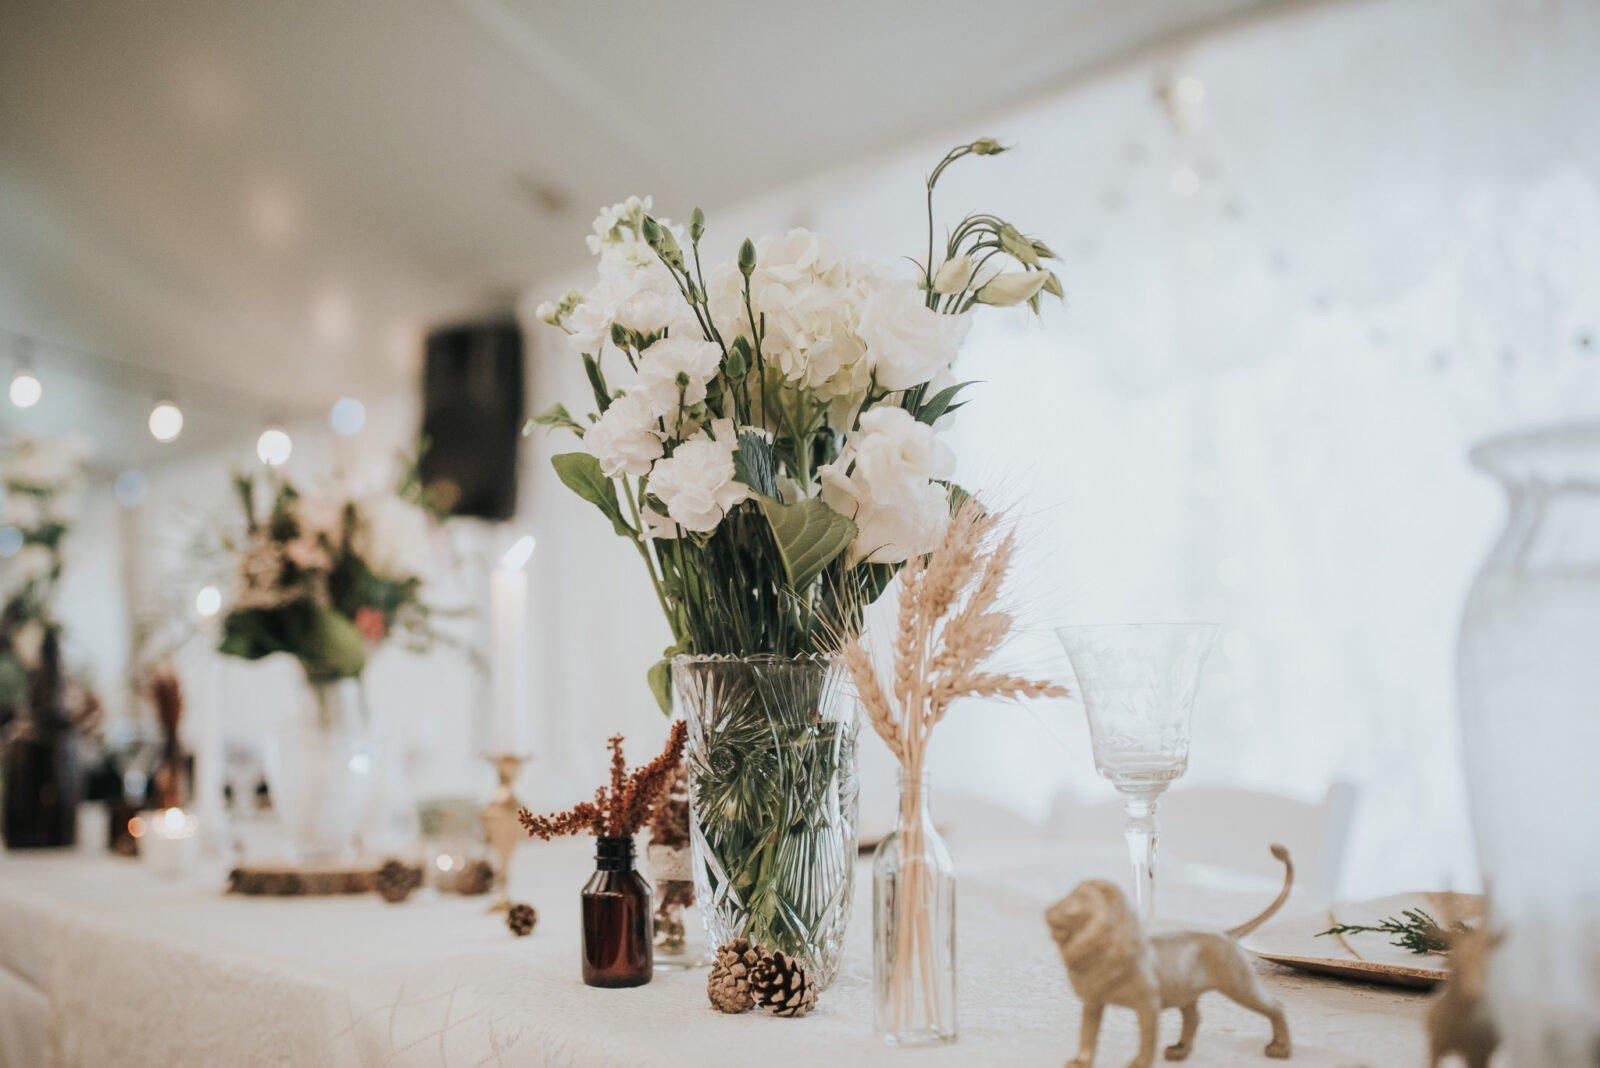 Wedding table decor for woodland wedding.